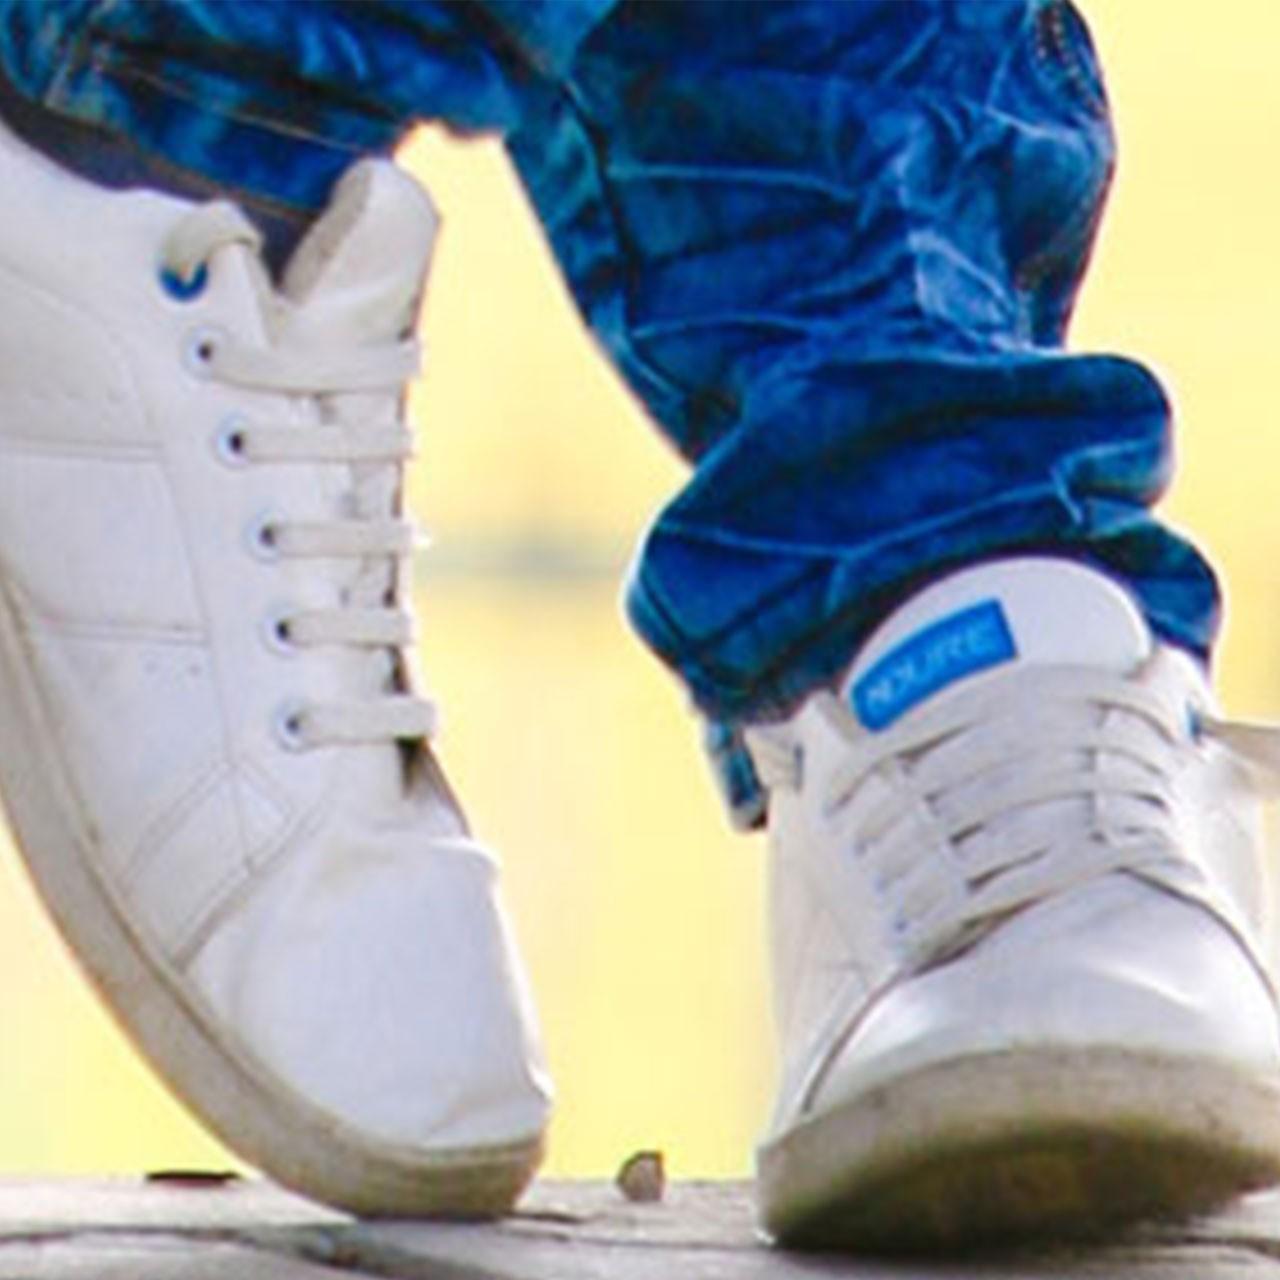 Chaussure junior, chaussures enfants